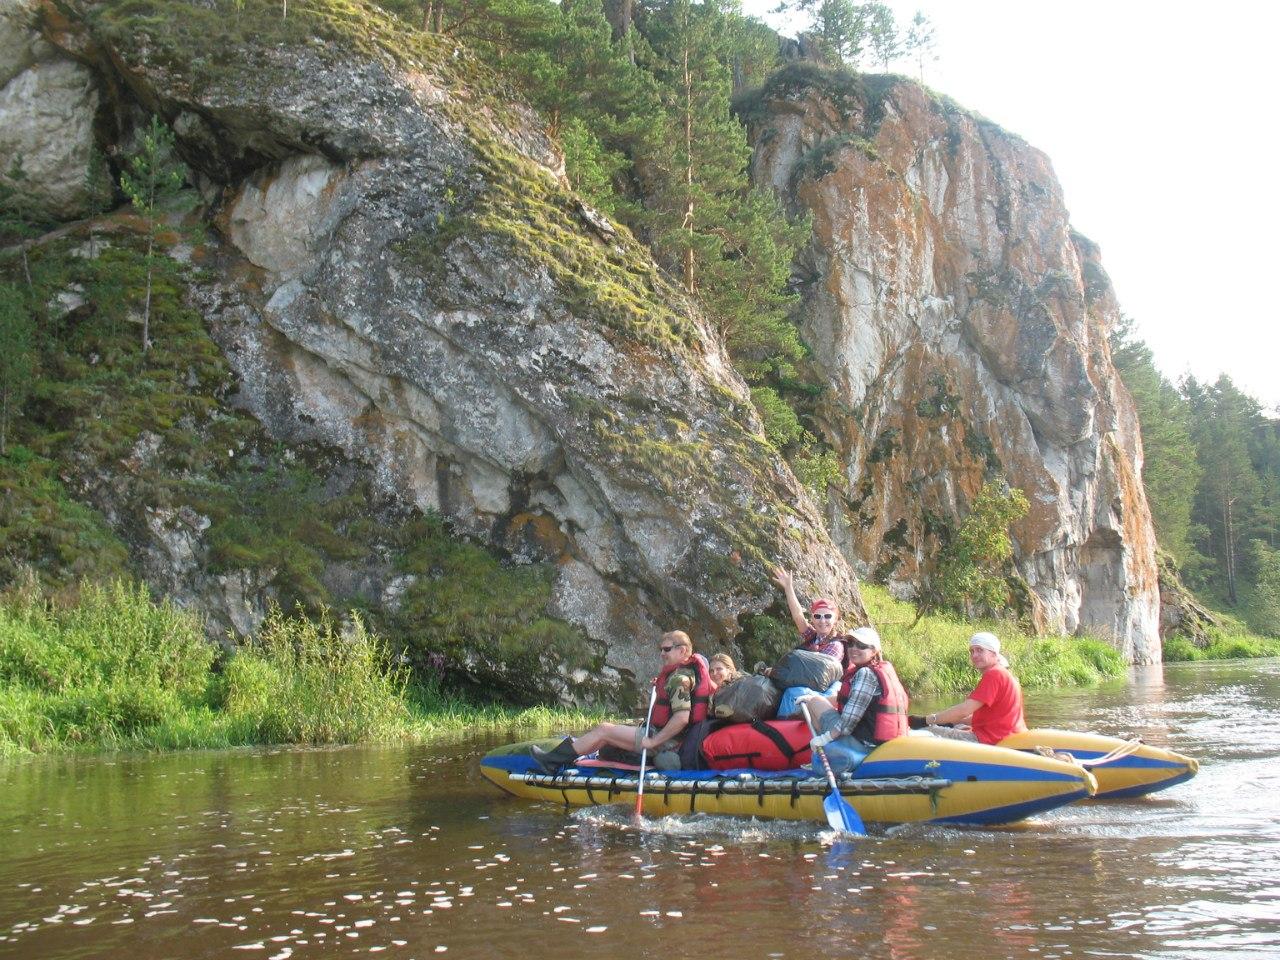 сплав по рекам екатеринбург